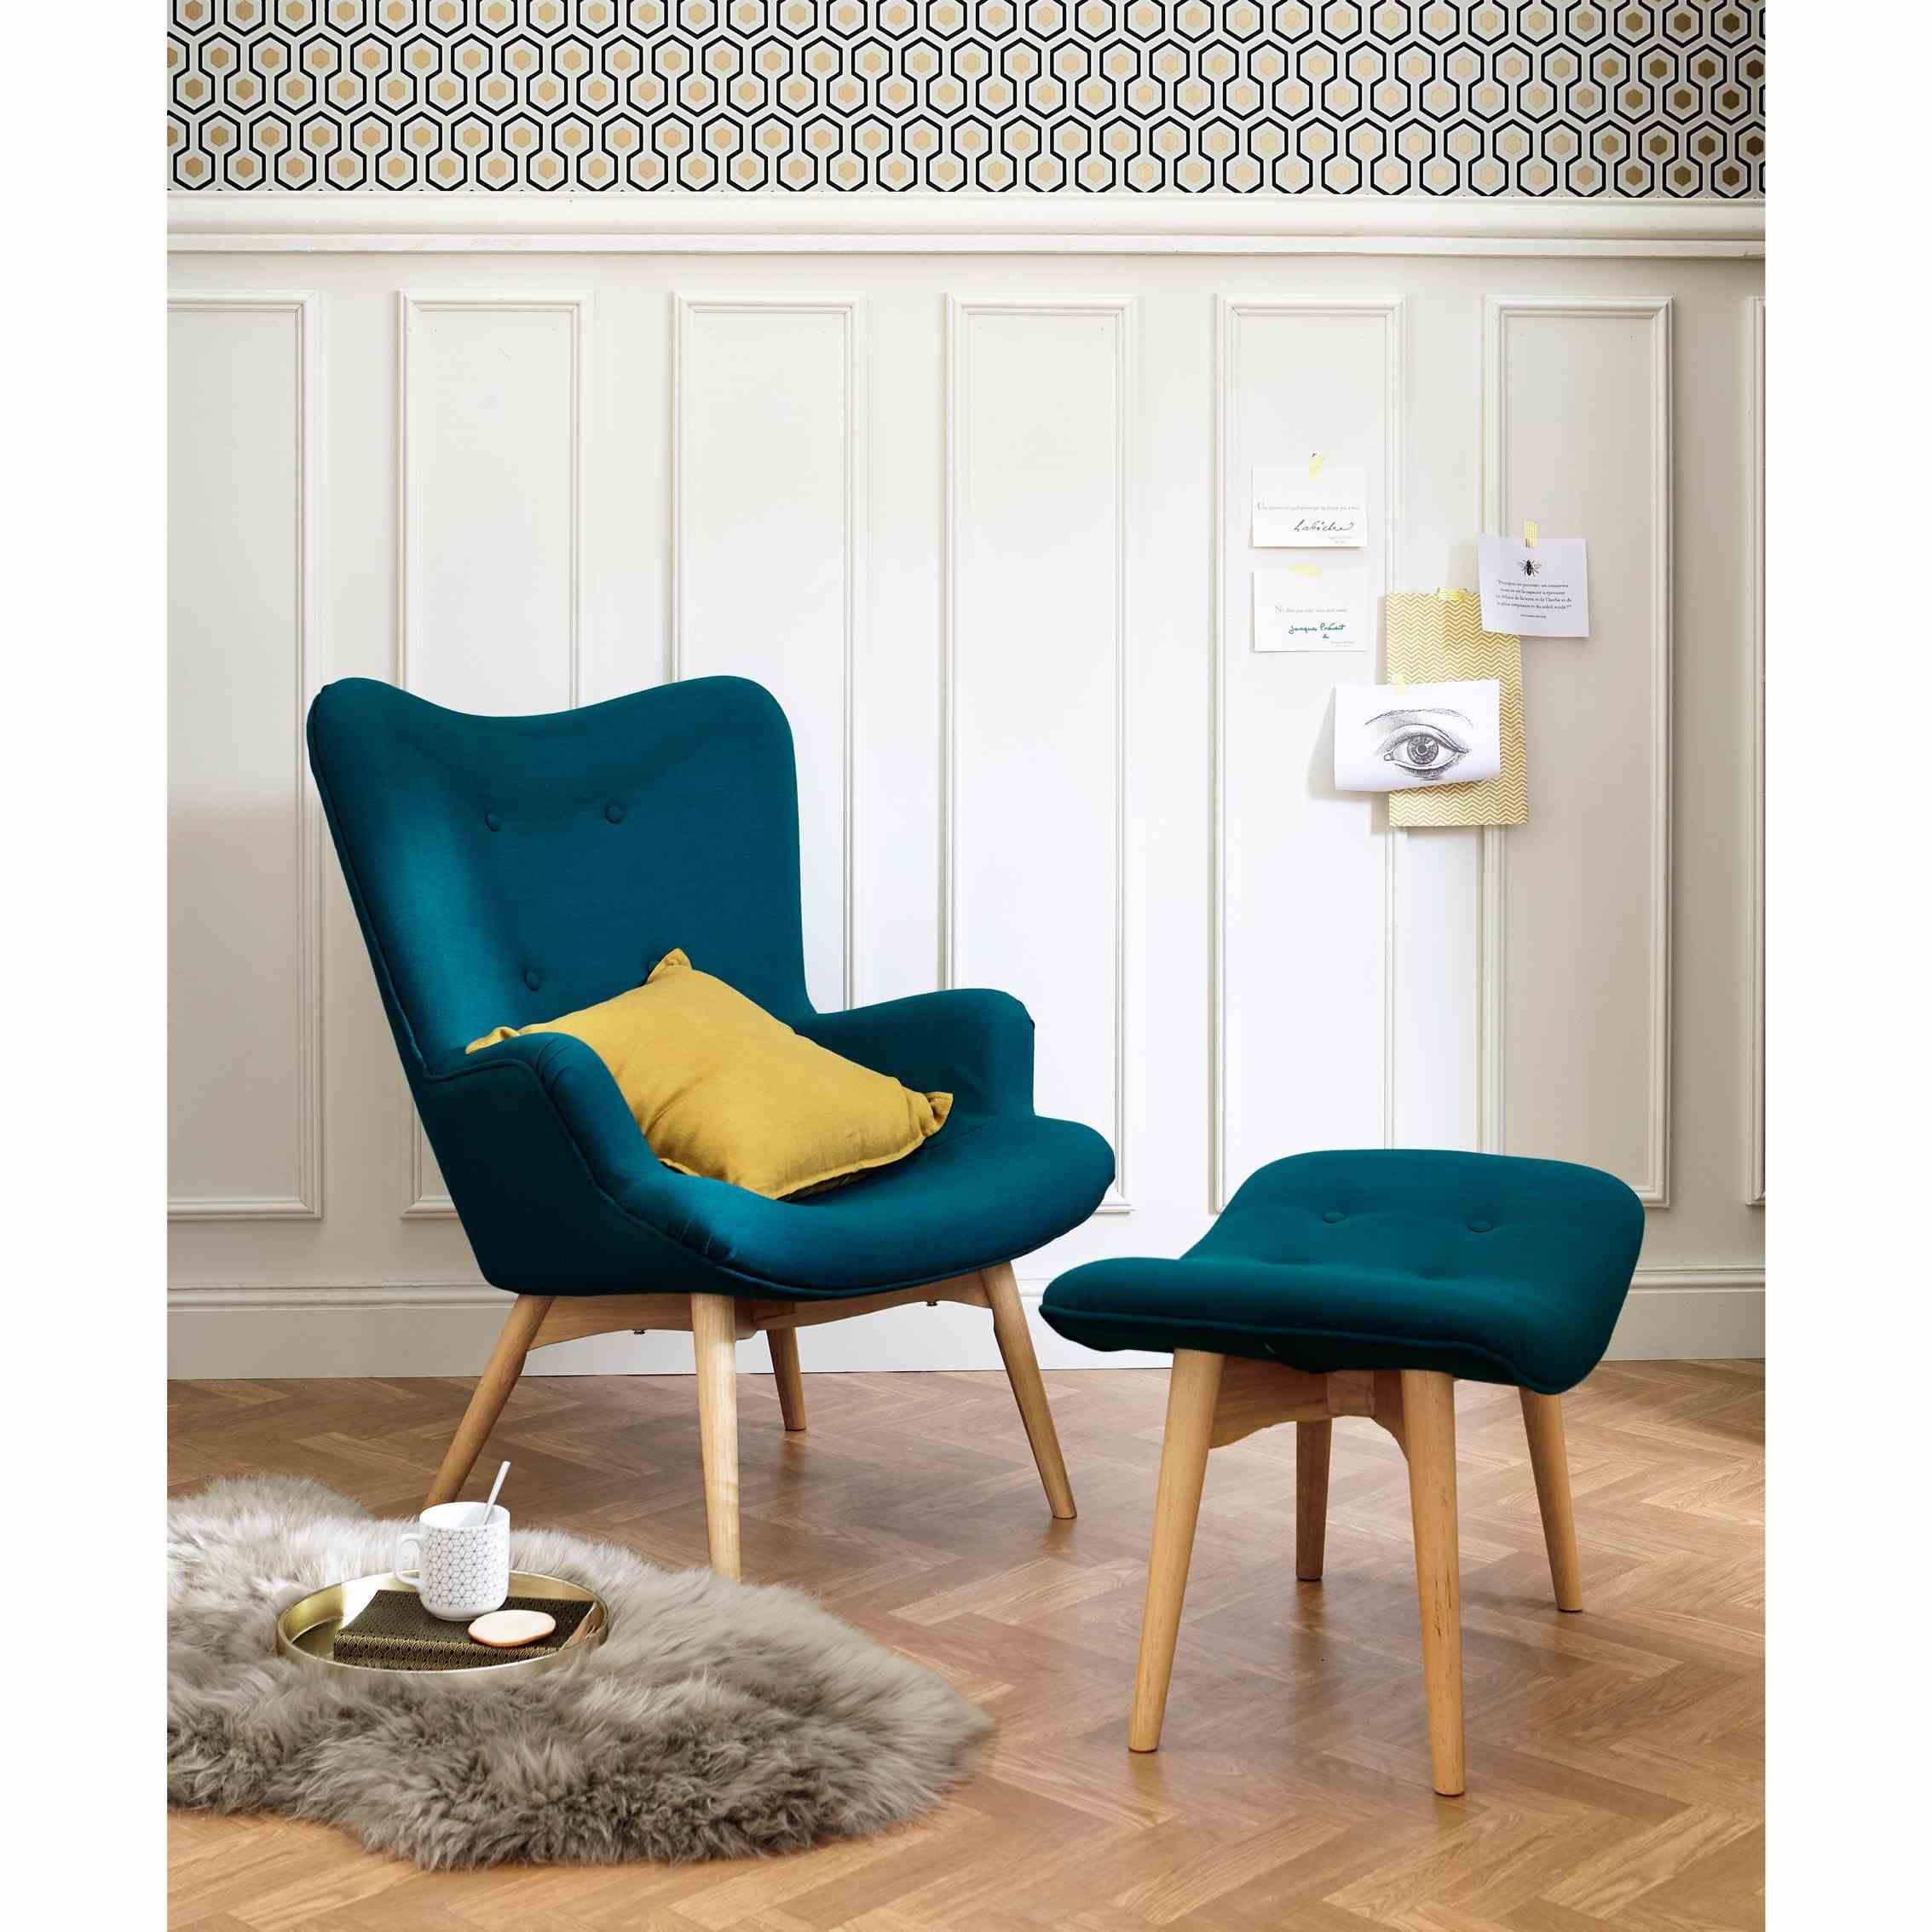 Fauteuil Scandinave En Tissu Gris Clair Maisons Du Monde Living Room Scandinavian New Living Room Living Room Chairs